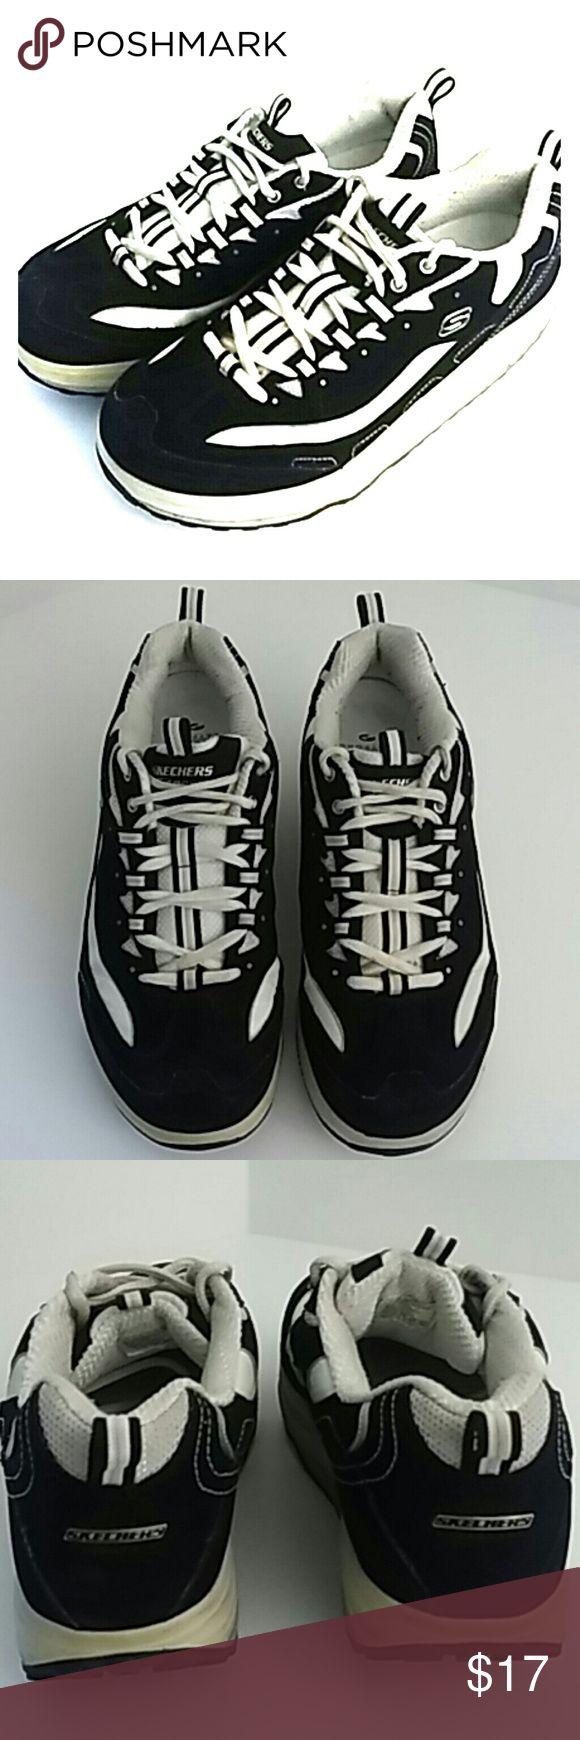 Skechers Shape Up 10 Black White Fitness Shoes Skechers Shape Up 10 Black White Fitness Shoes  Normal wear. Little wear on tread. Skechers Shoes Athletic Shoes